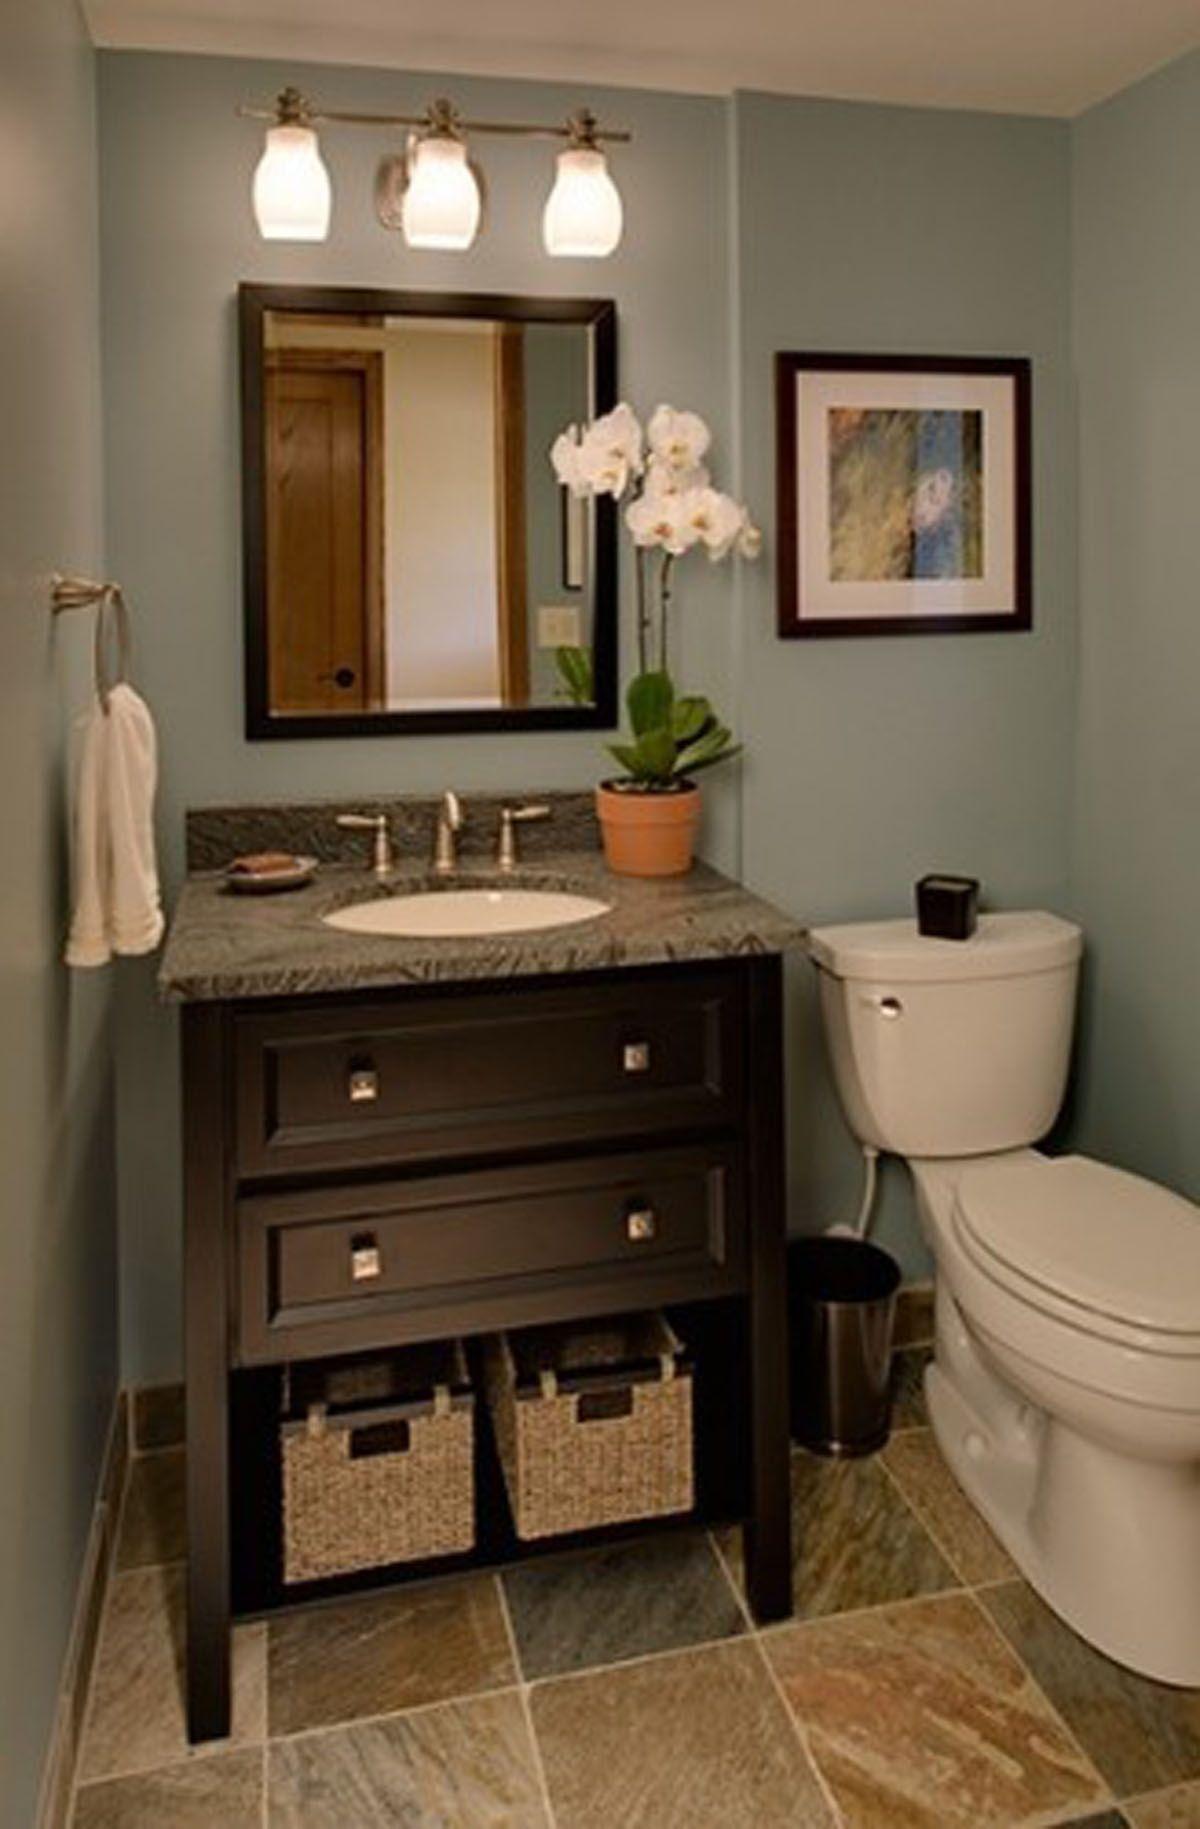 Rustic half bathroom ideas Shiplap Bathroom Rustic Small Half Bathroom Ideas modern Double Sink Bing Bathroom Rustic Small Half Bathroom Ideas modern Double Sink